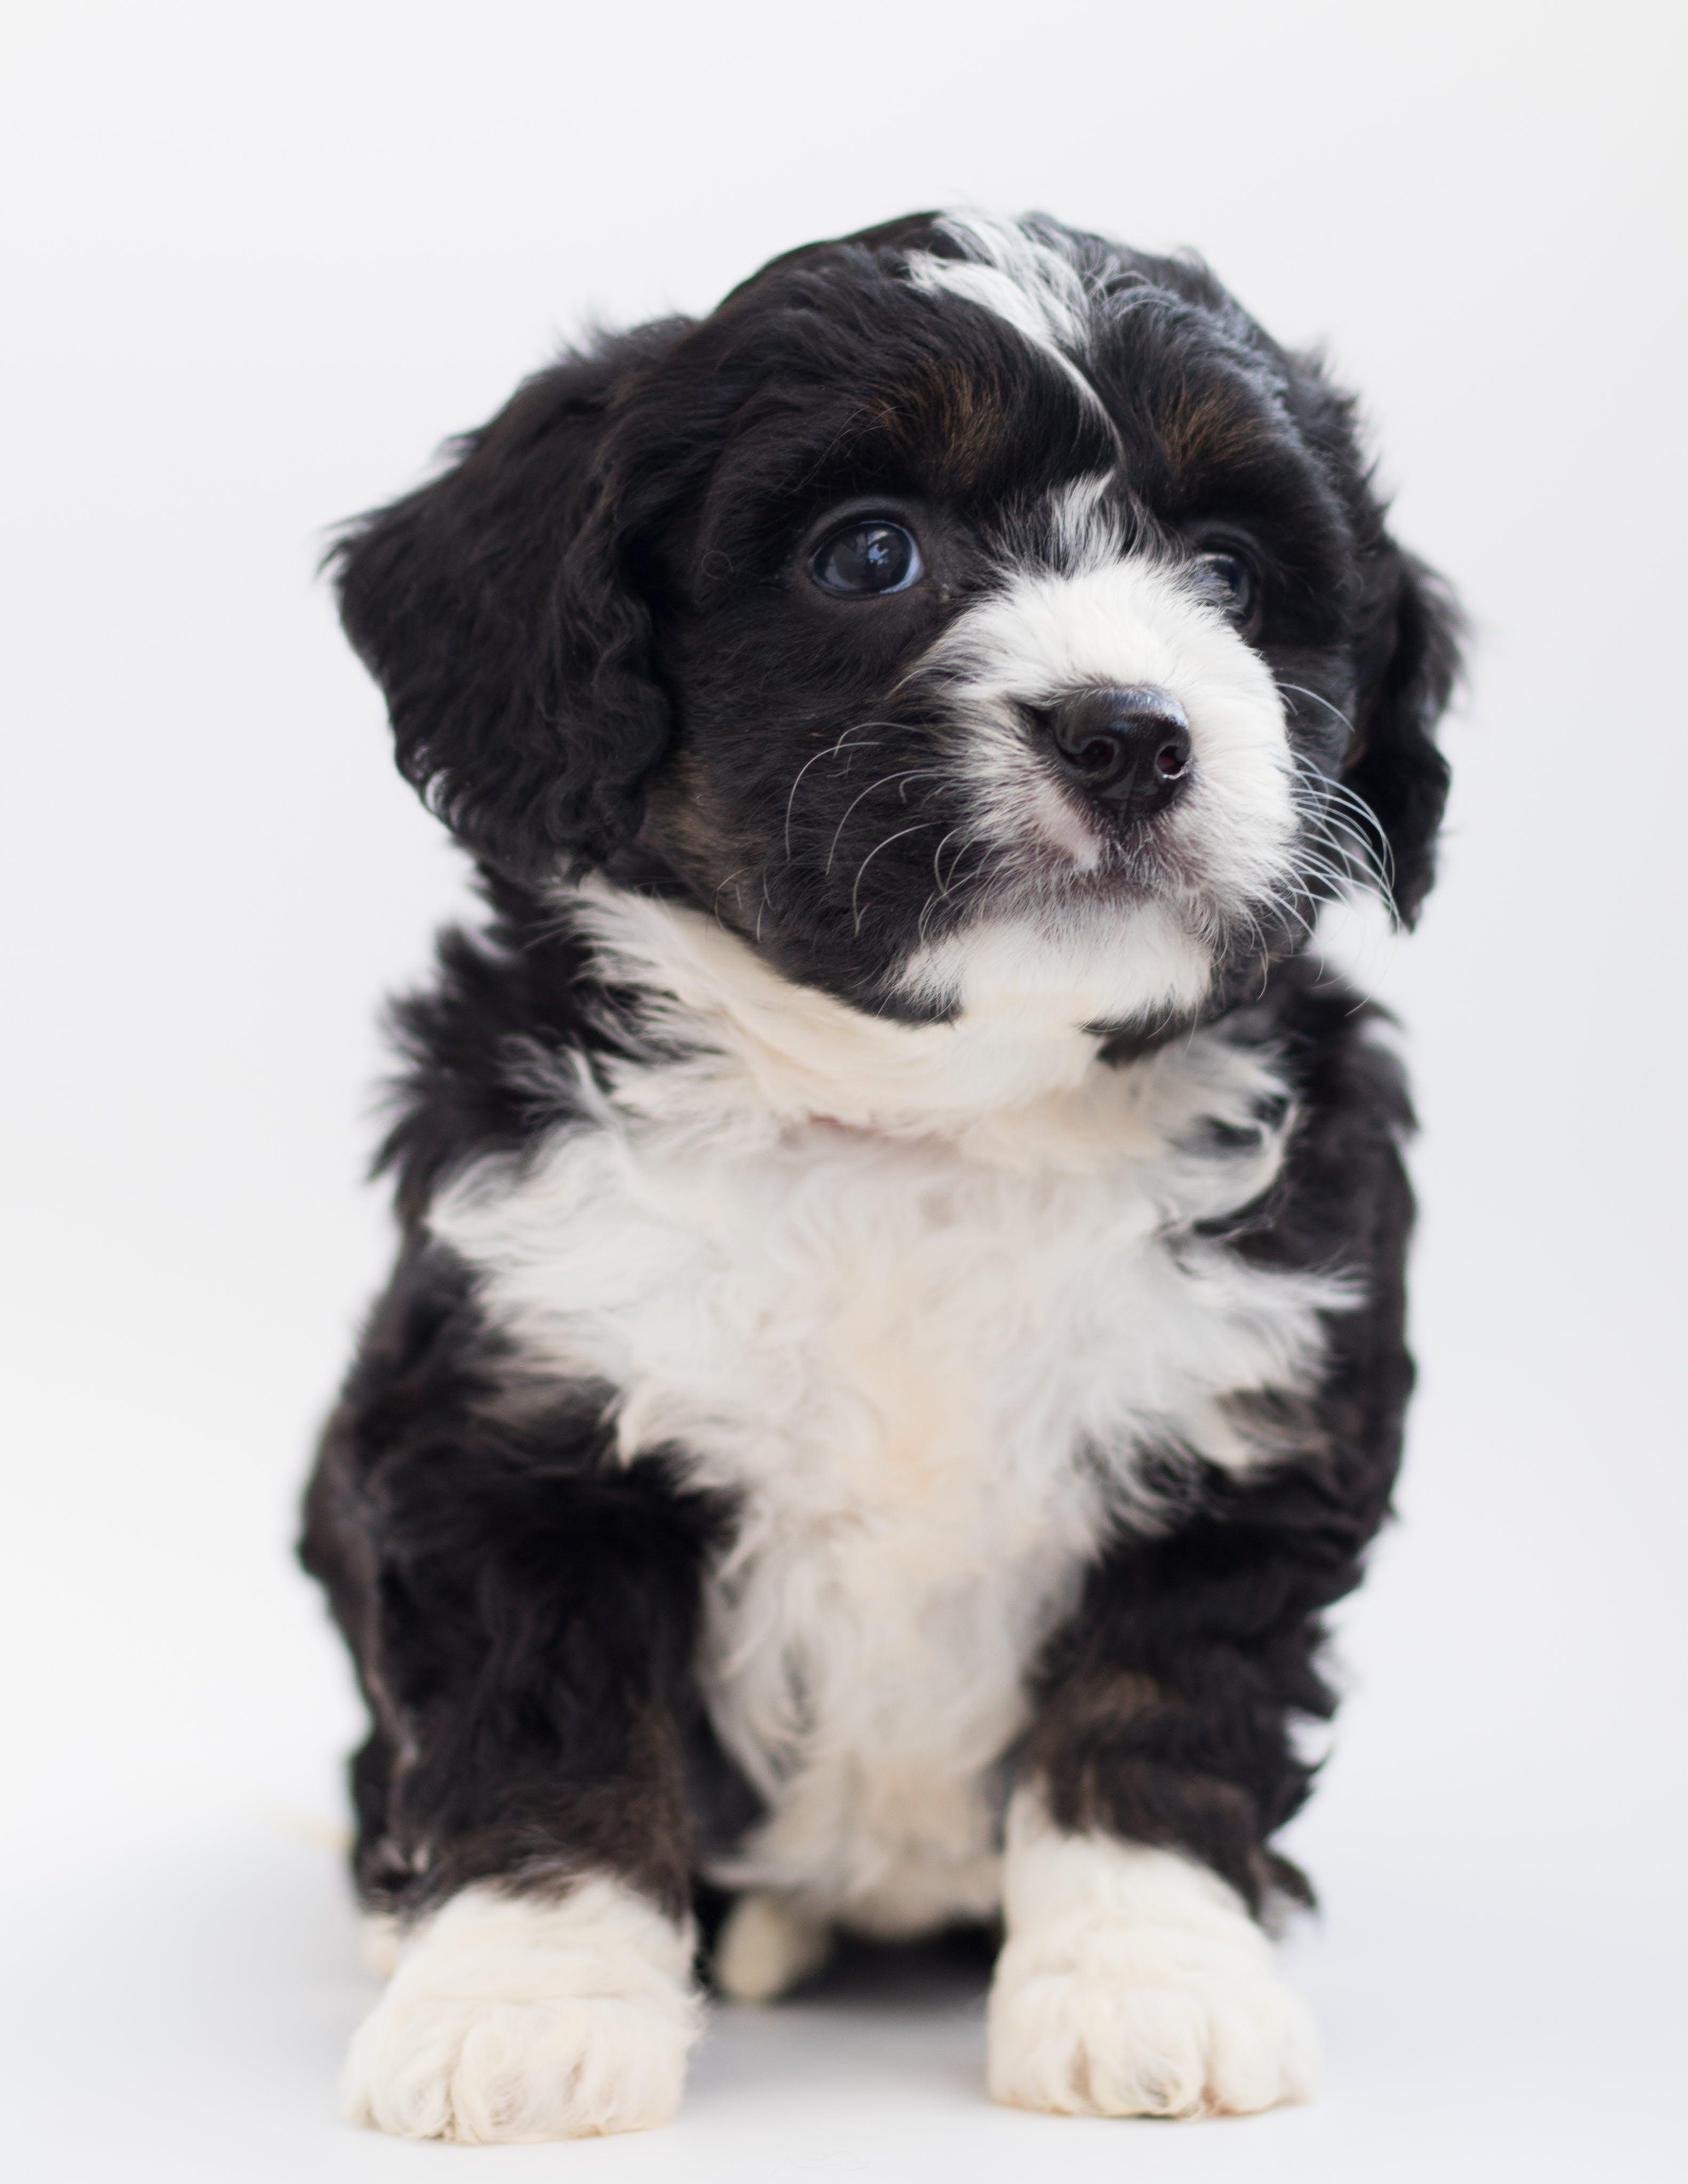 White and Black Maltese Puppy